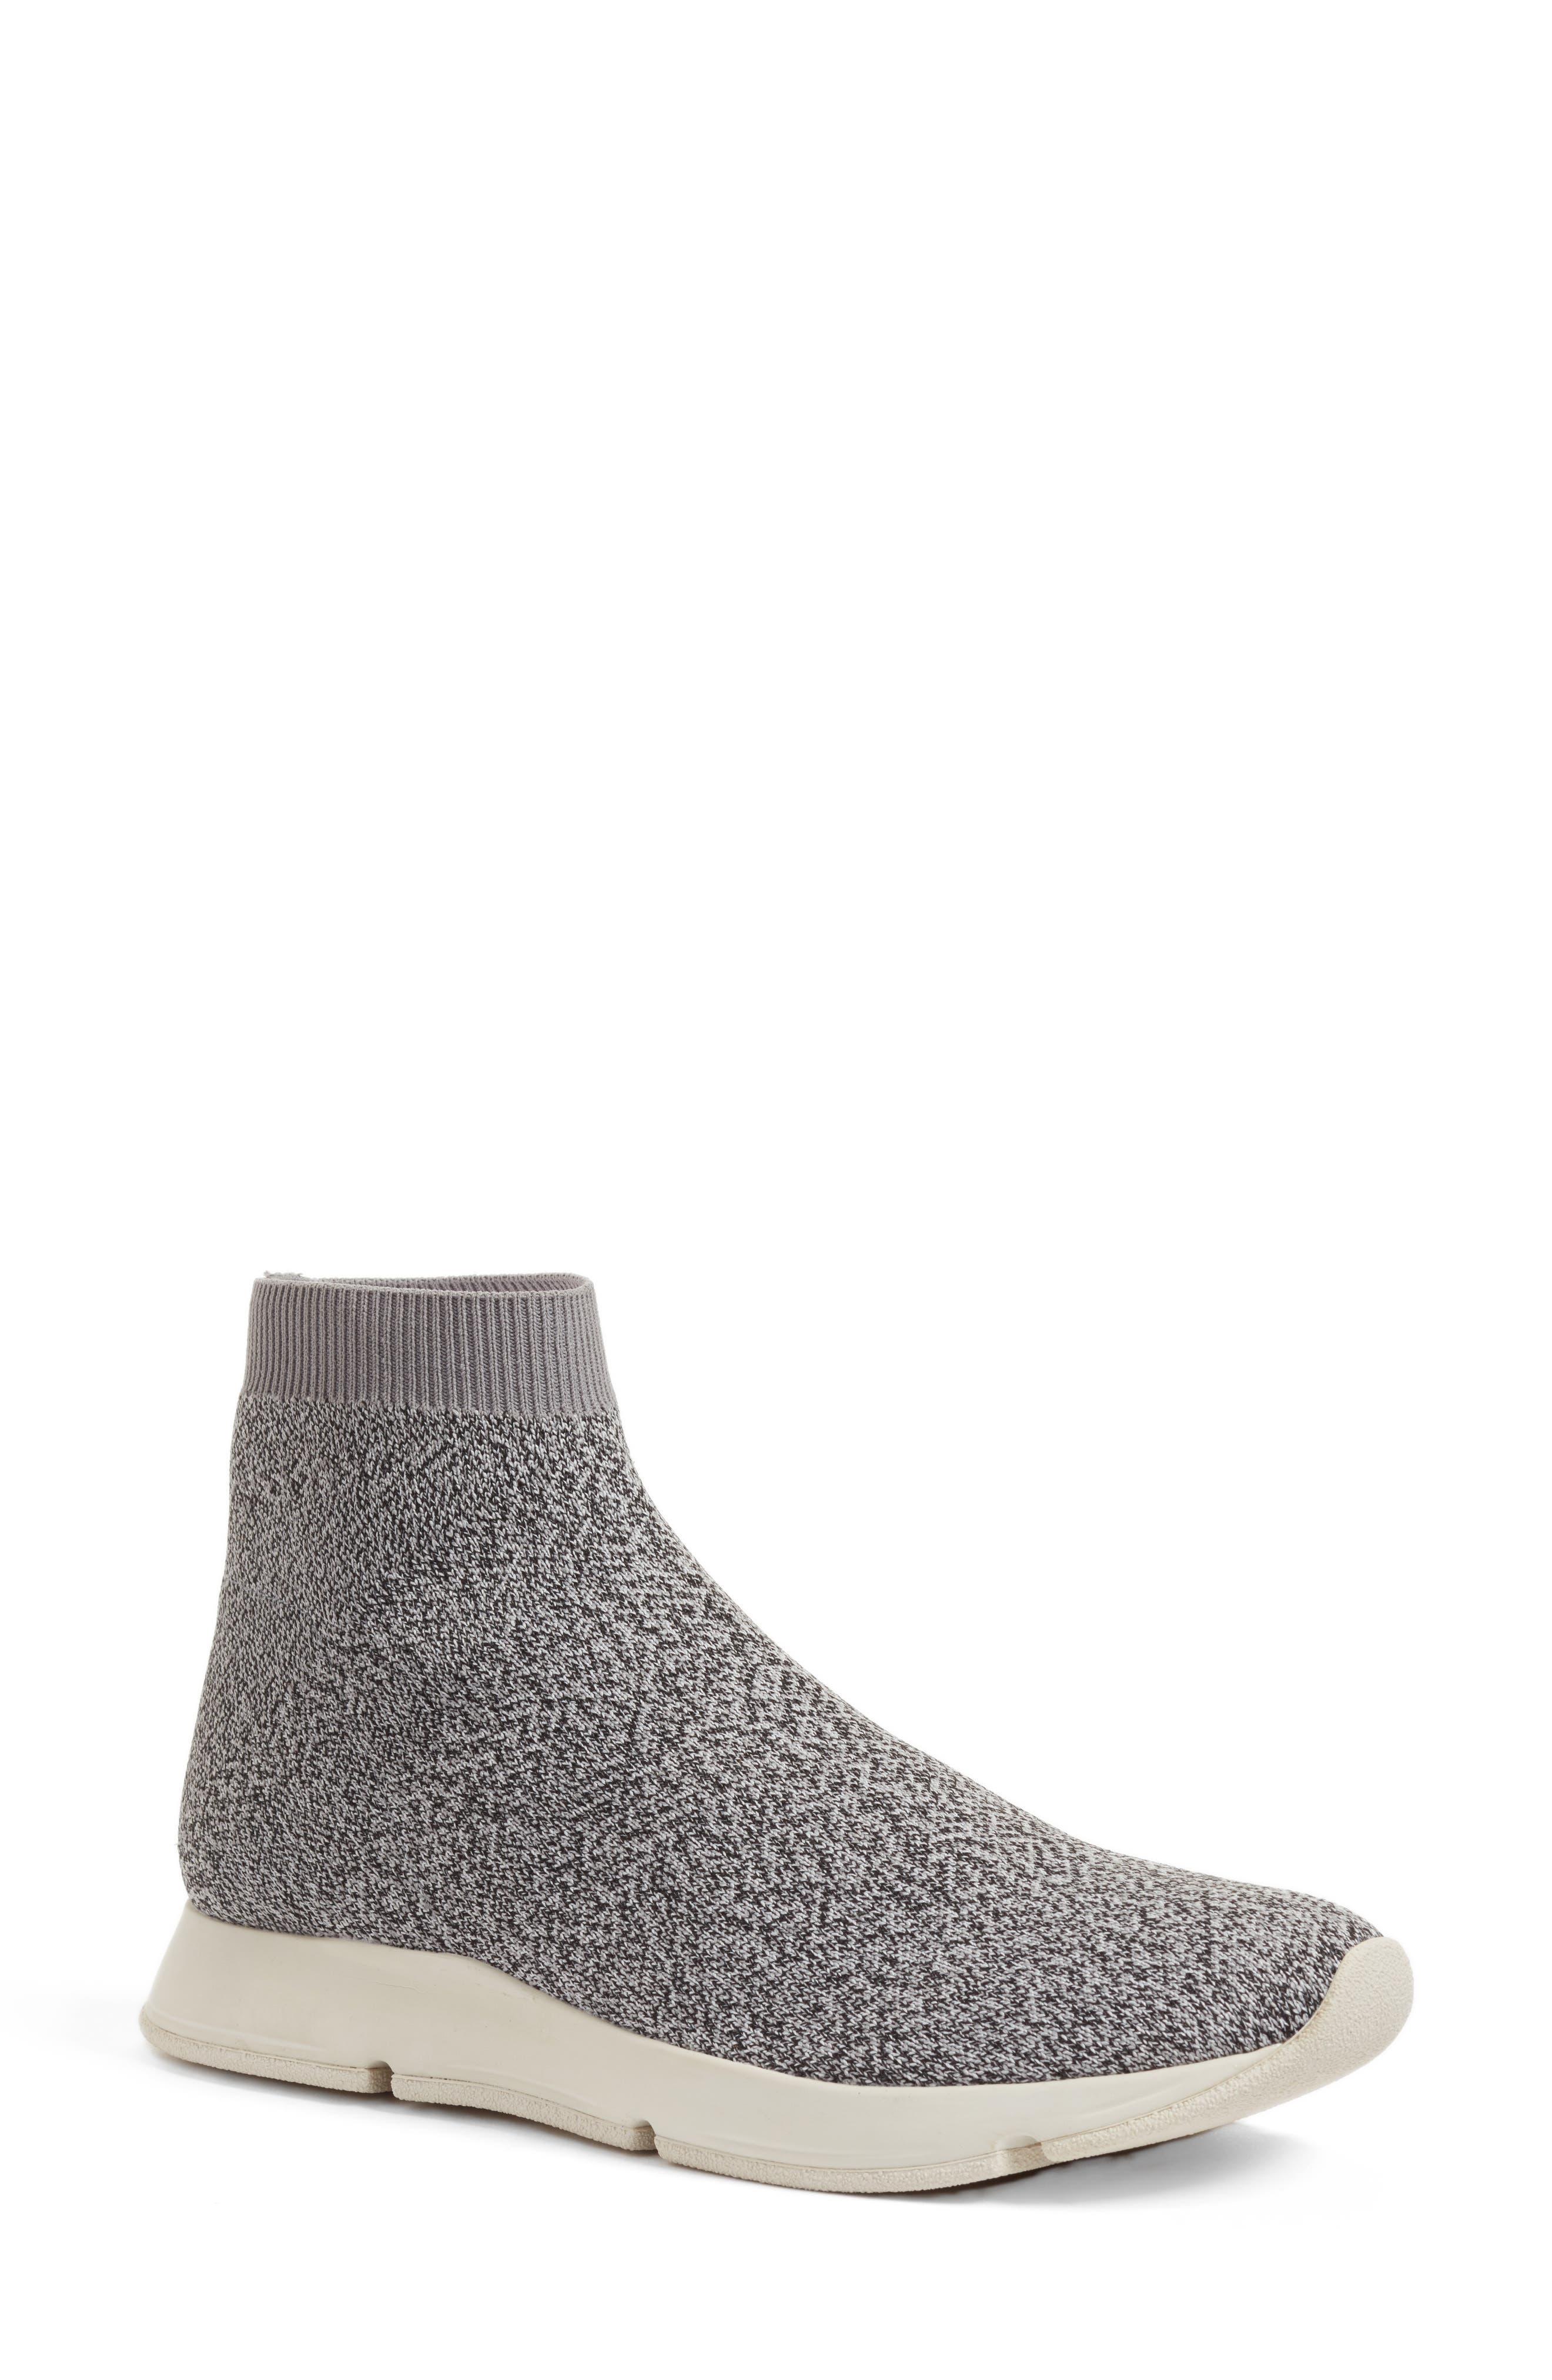 Tyra Sock Sneaker,                         Main,                         color, Grey Marl